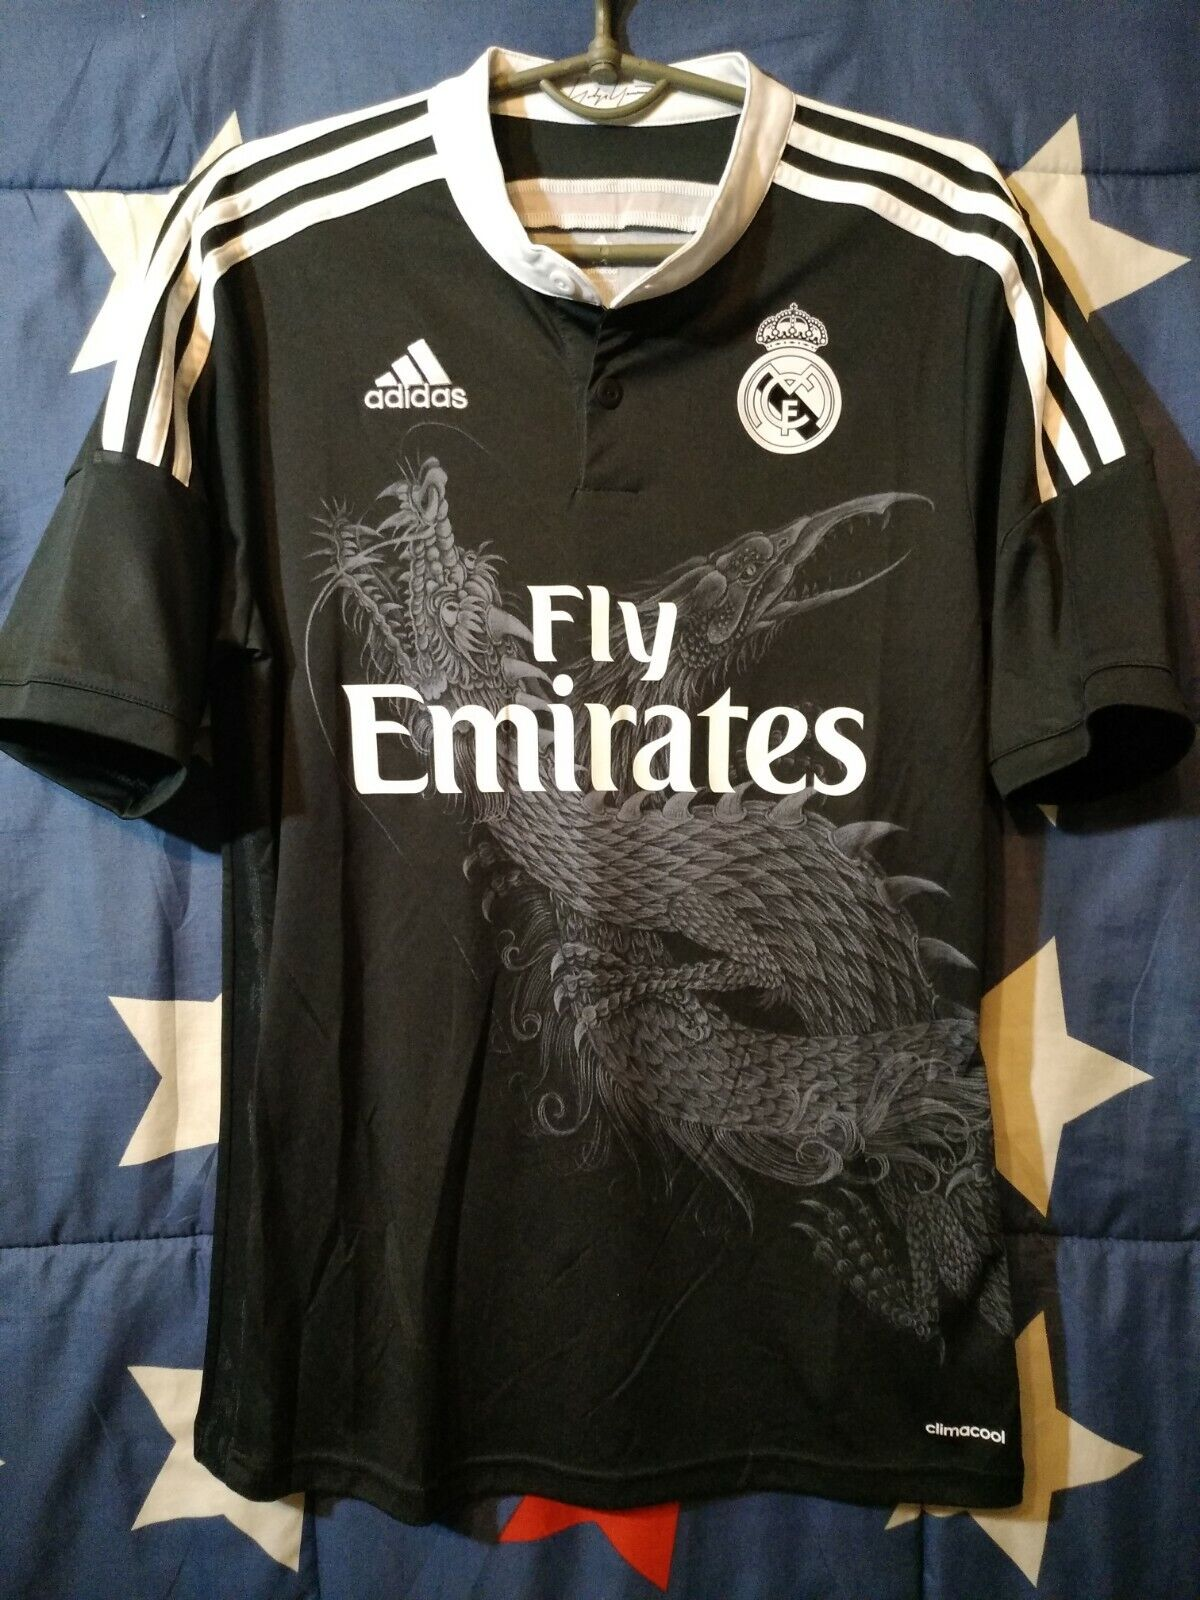 Größe S Real Madrid Spain 2014-2015 2014-2015 2014-2015 Third Football Shirt Adidas Yohji Yamamoto 09d2f4